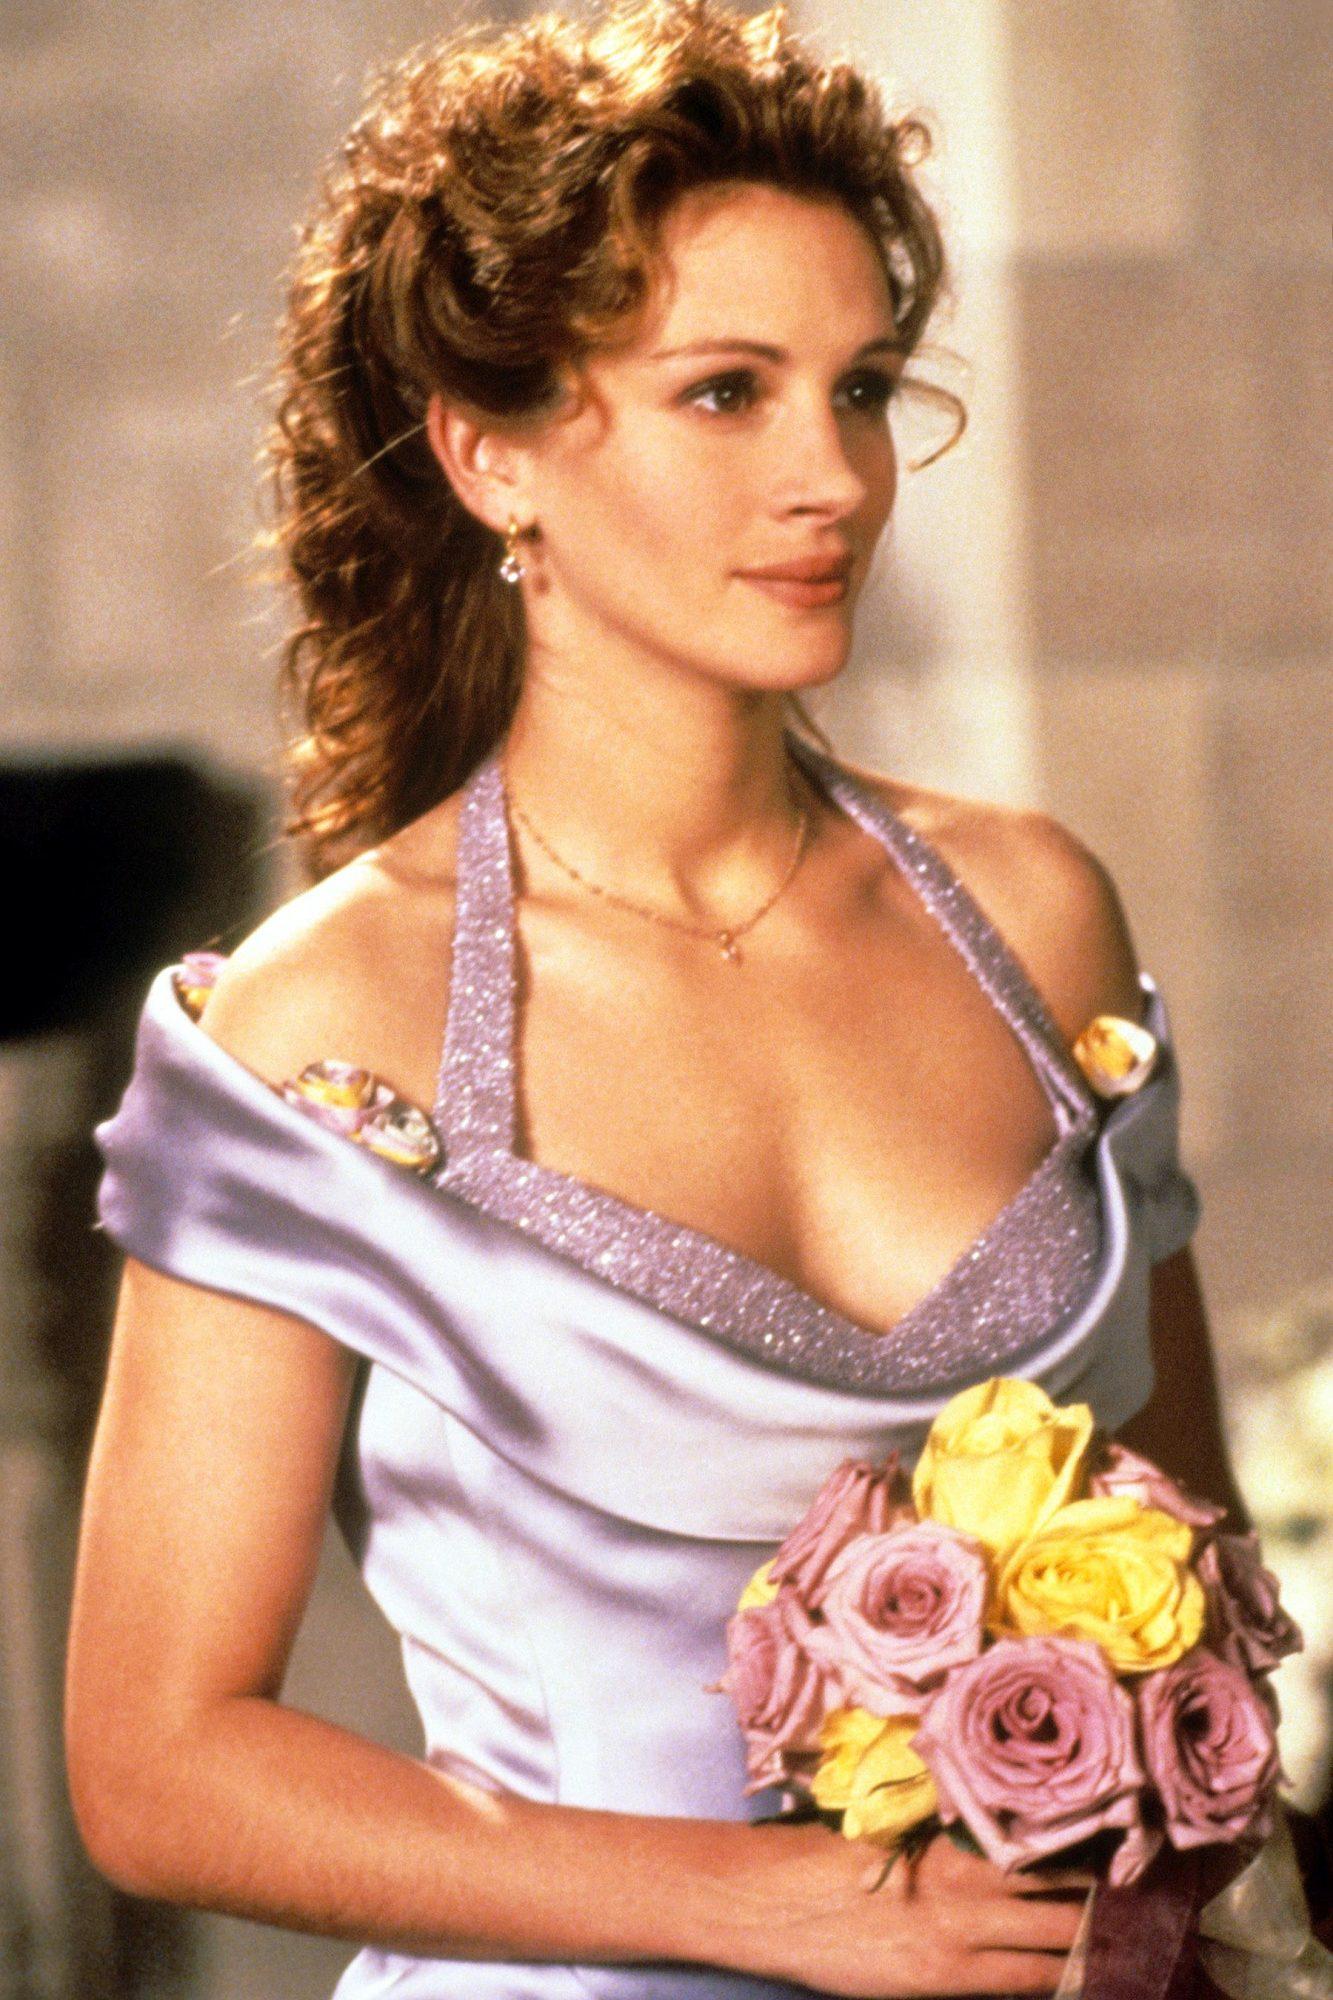 MY BEST FRIEND'S WEDDING, Julia Roberts, 1997, (c) TriStar/courtesy Everett Collection